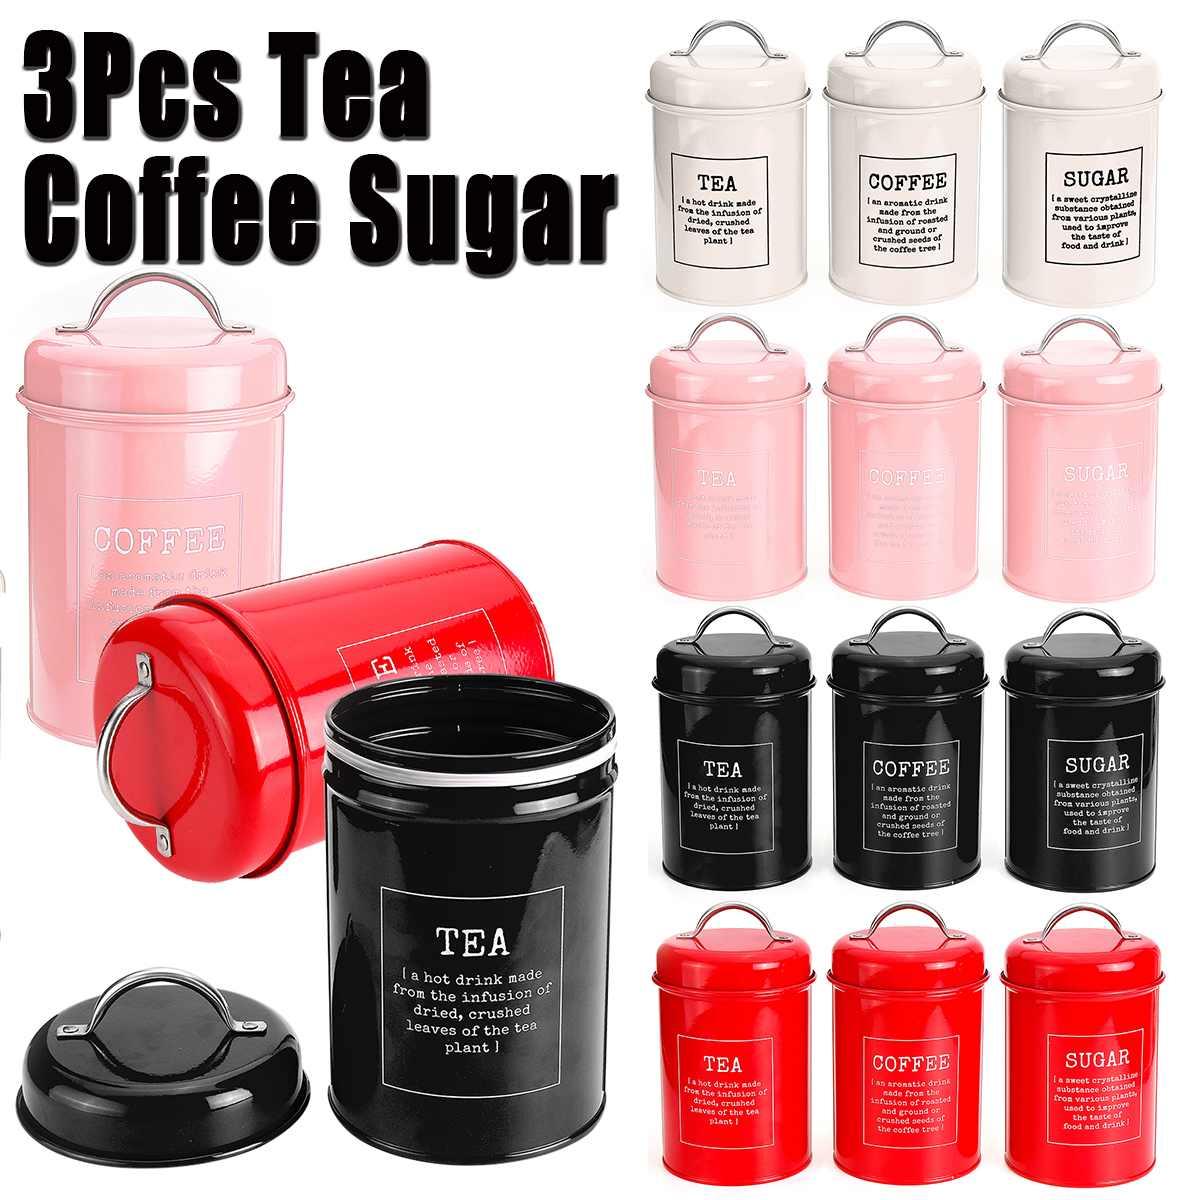 3Pcs/Set Storage Tank Cover Steel Kitchen Utensils Multifunction  Sugar Tea Coffee Box Case Household Food Canister Snack TankStorage  Bottles